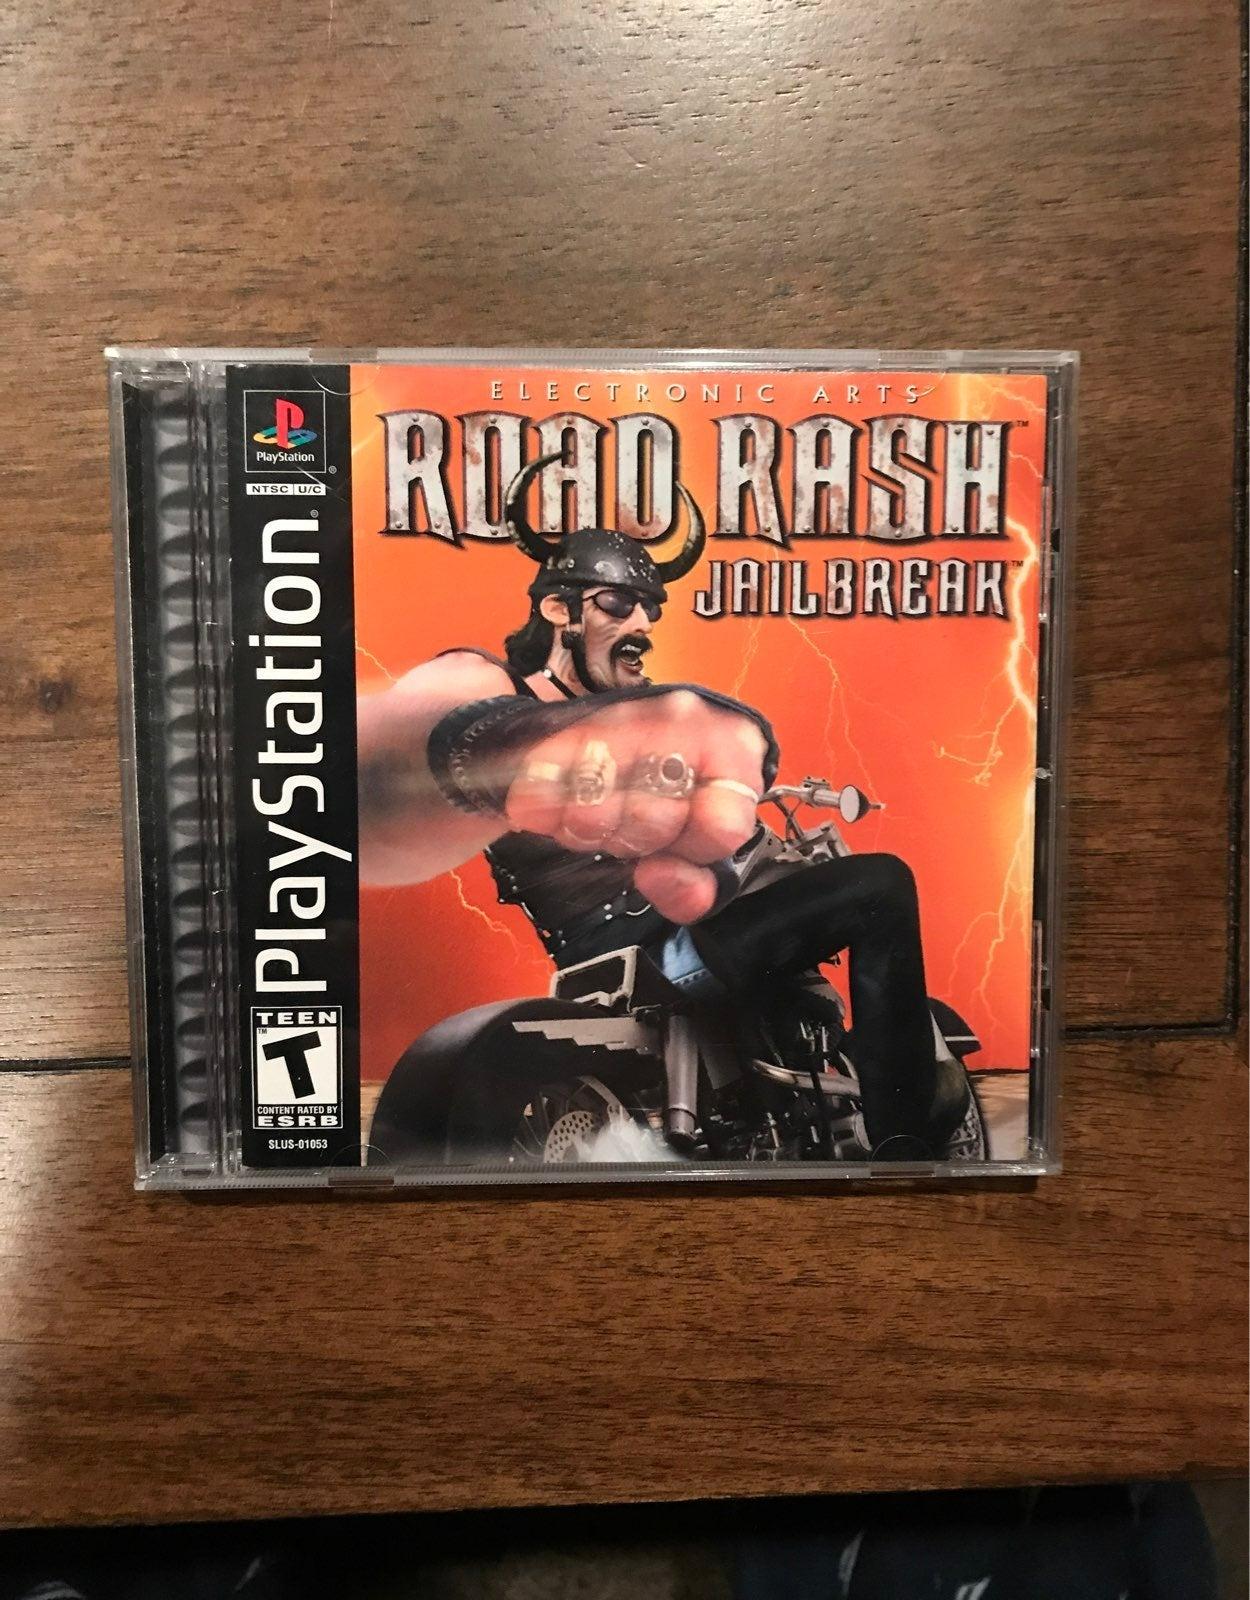 Road Rash: Jailbreak on Playstation 1